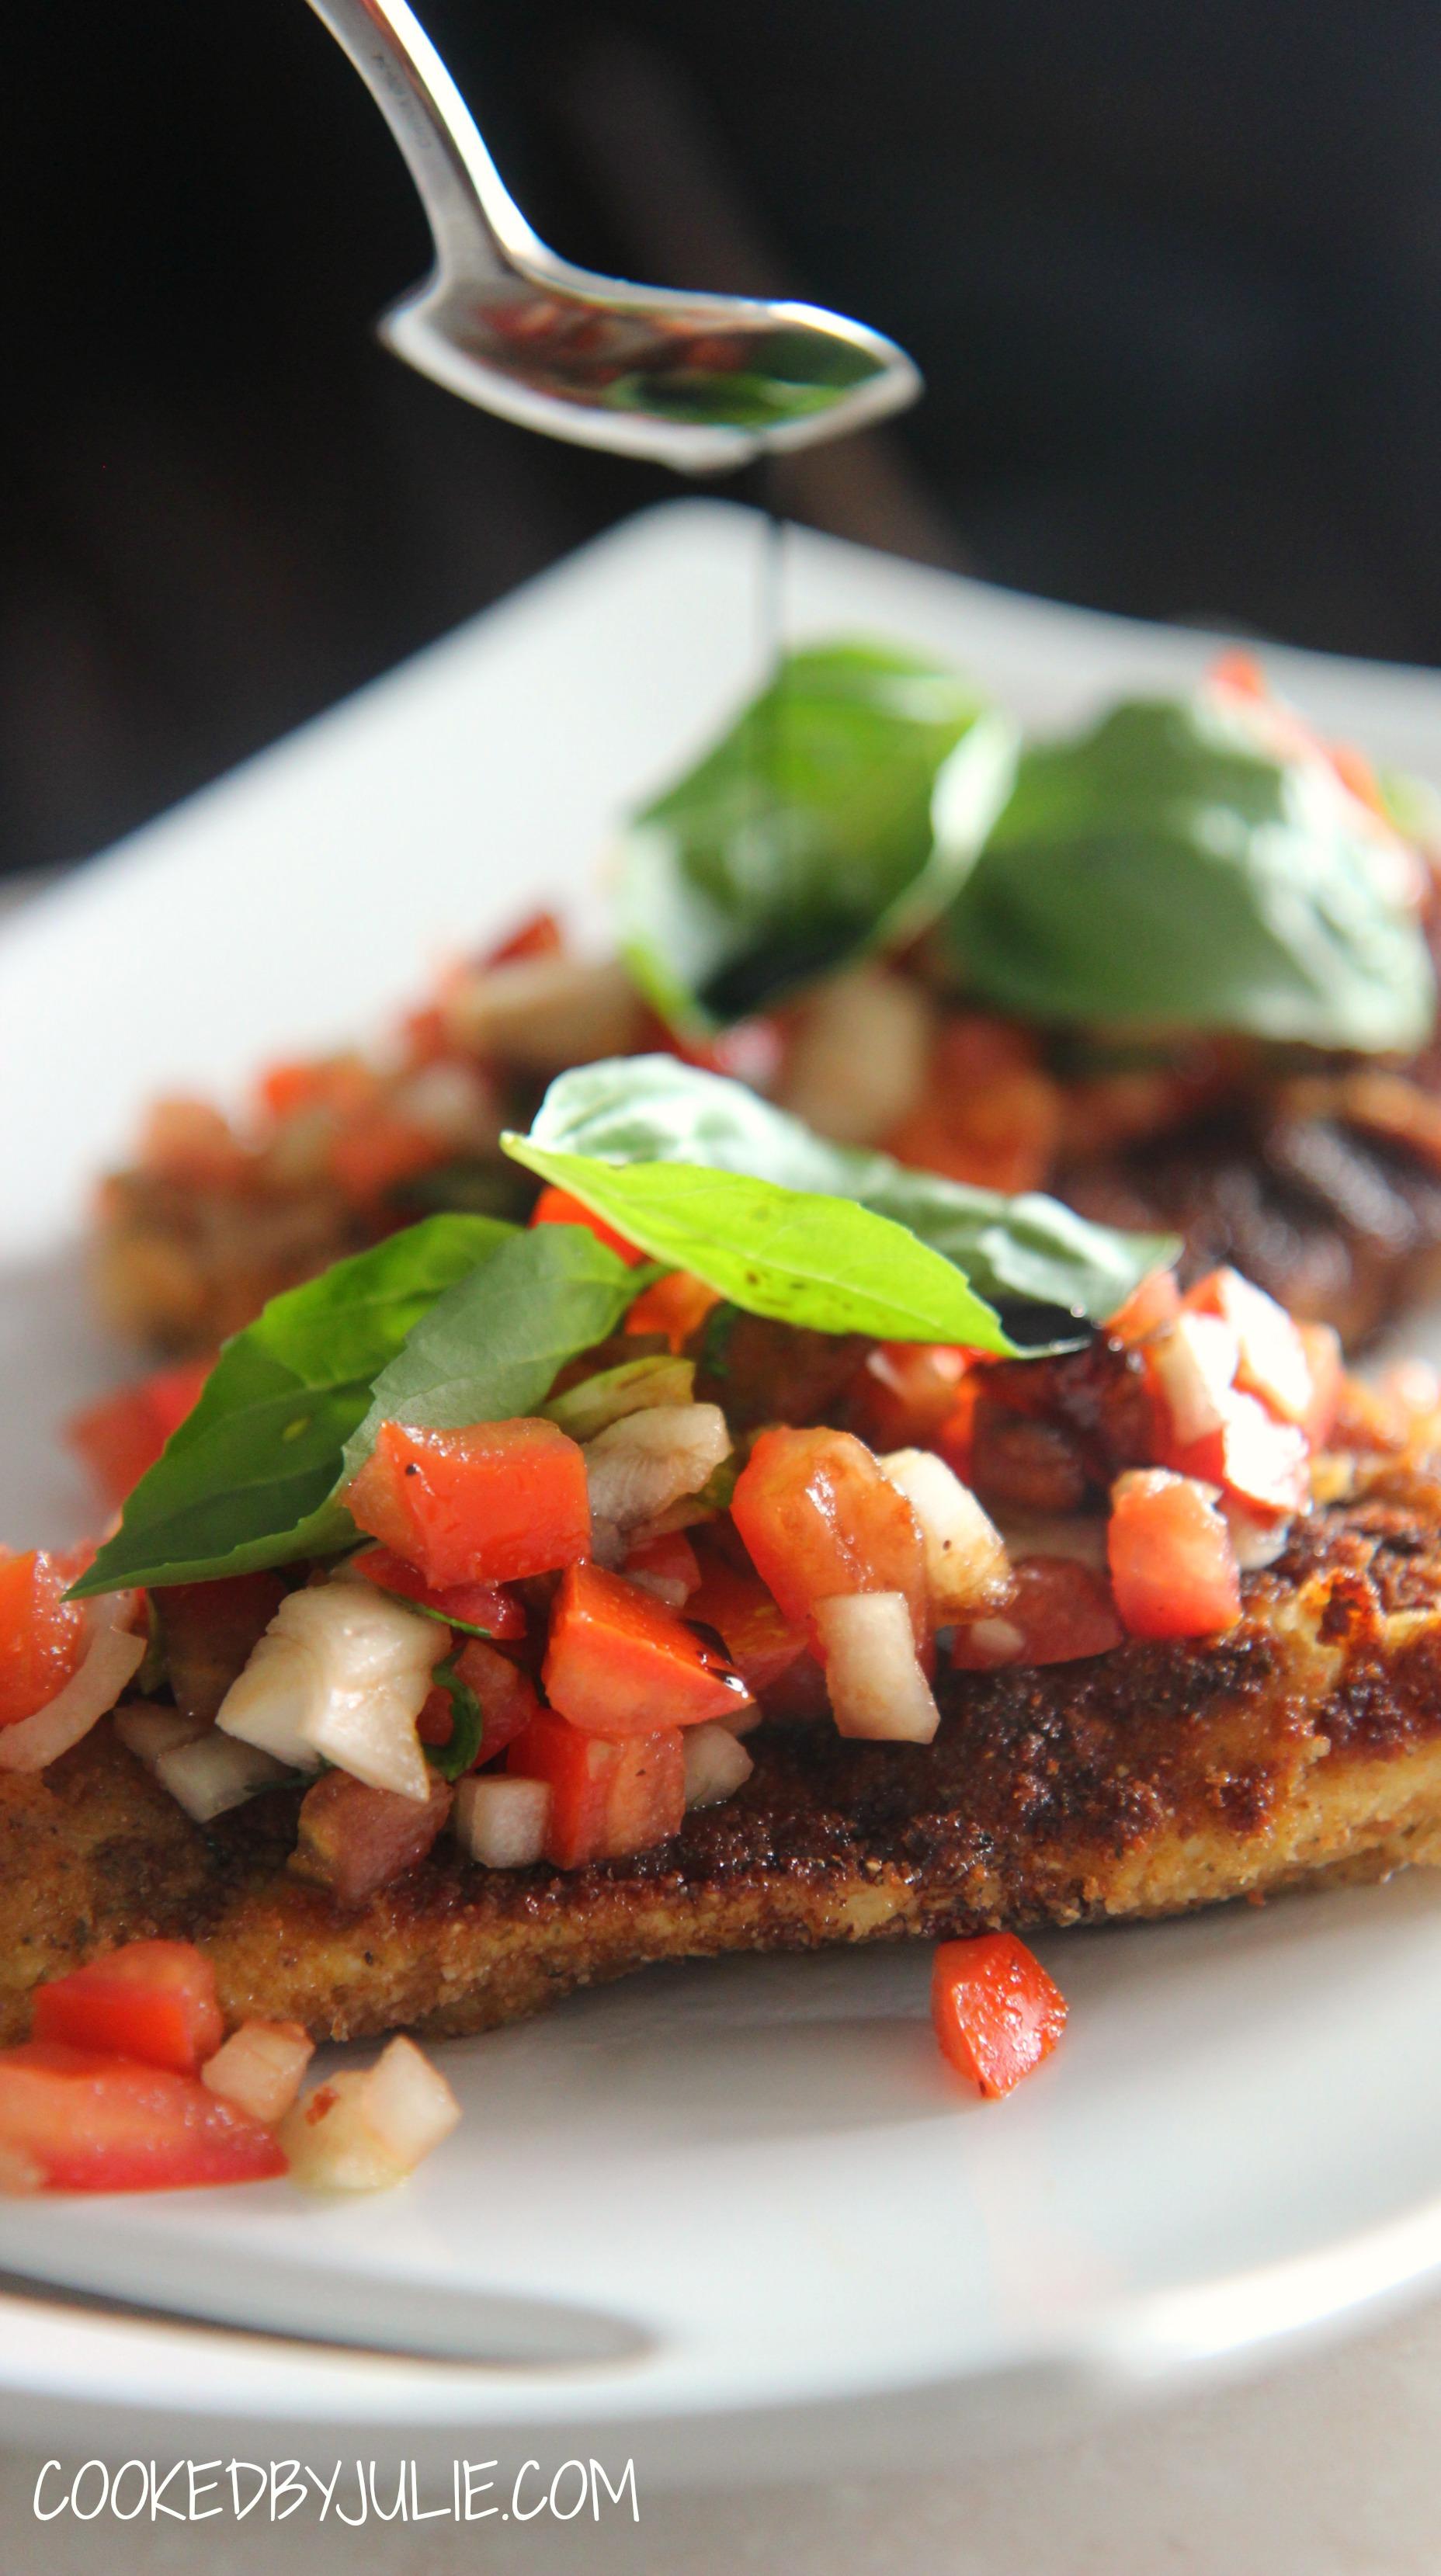 Chicken Bruschetta with tomatoes, onions, mozzarella cheese and basil.